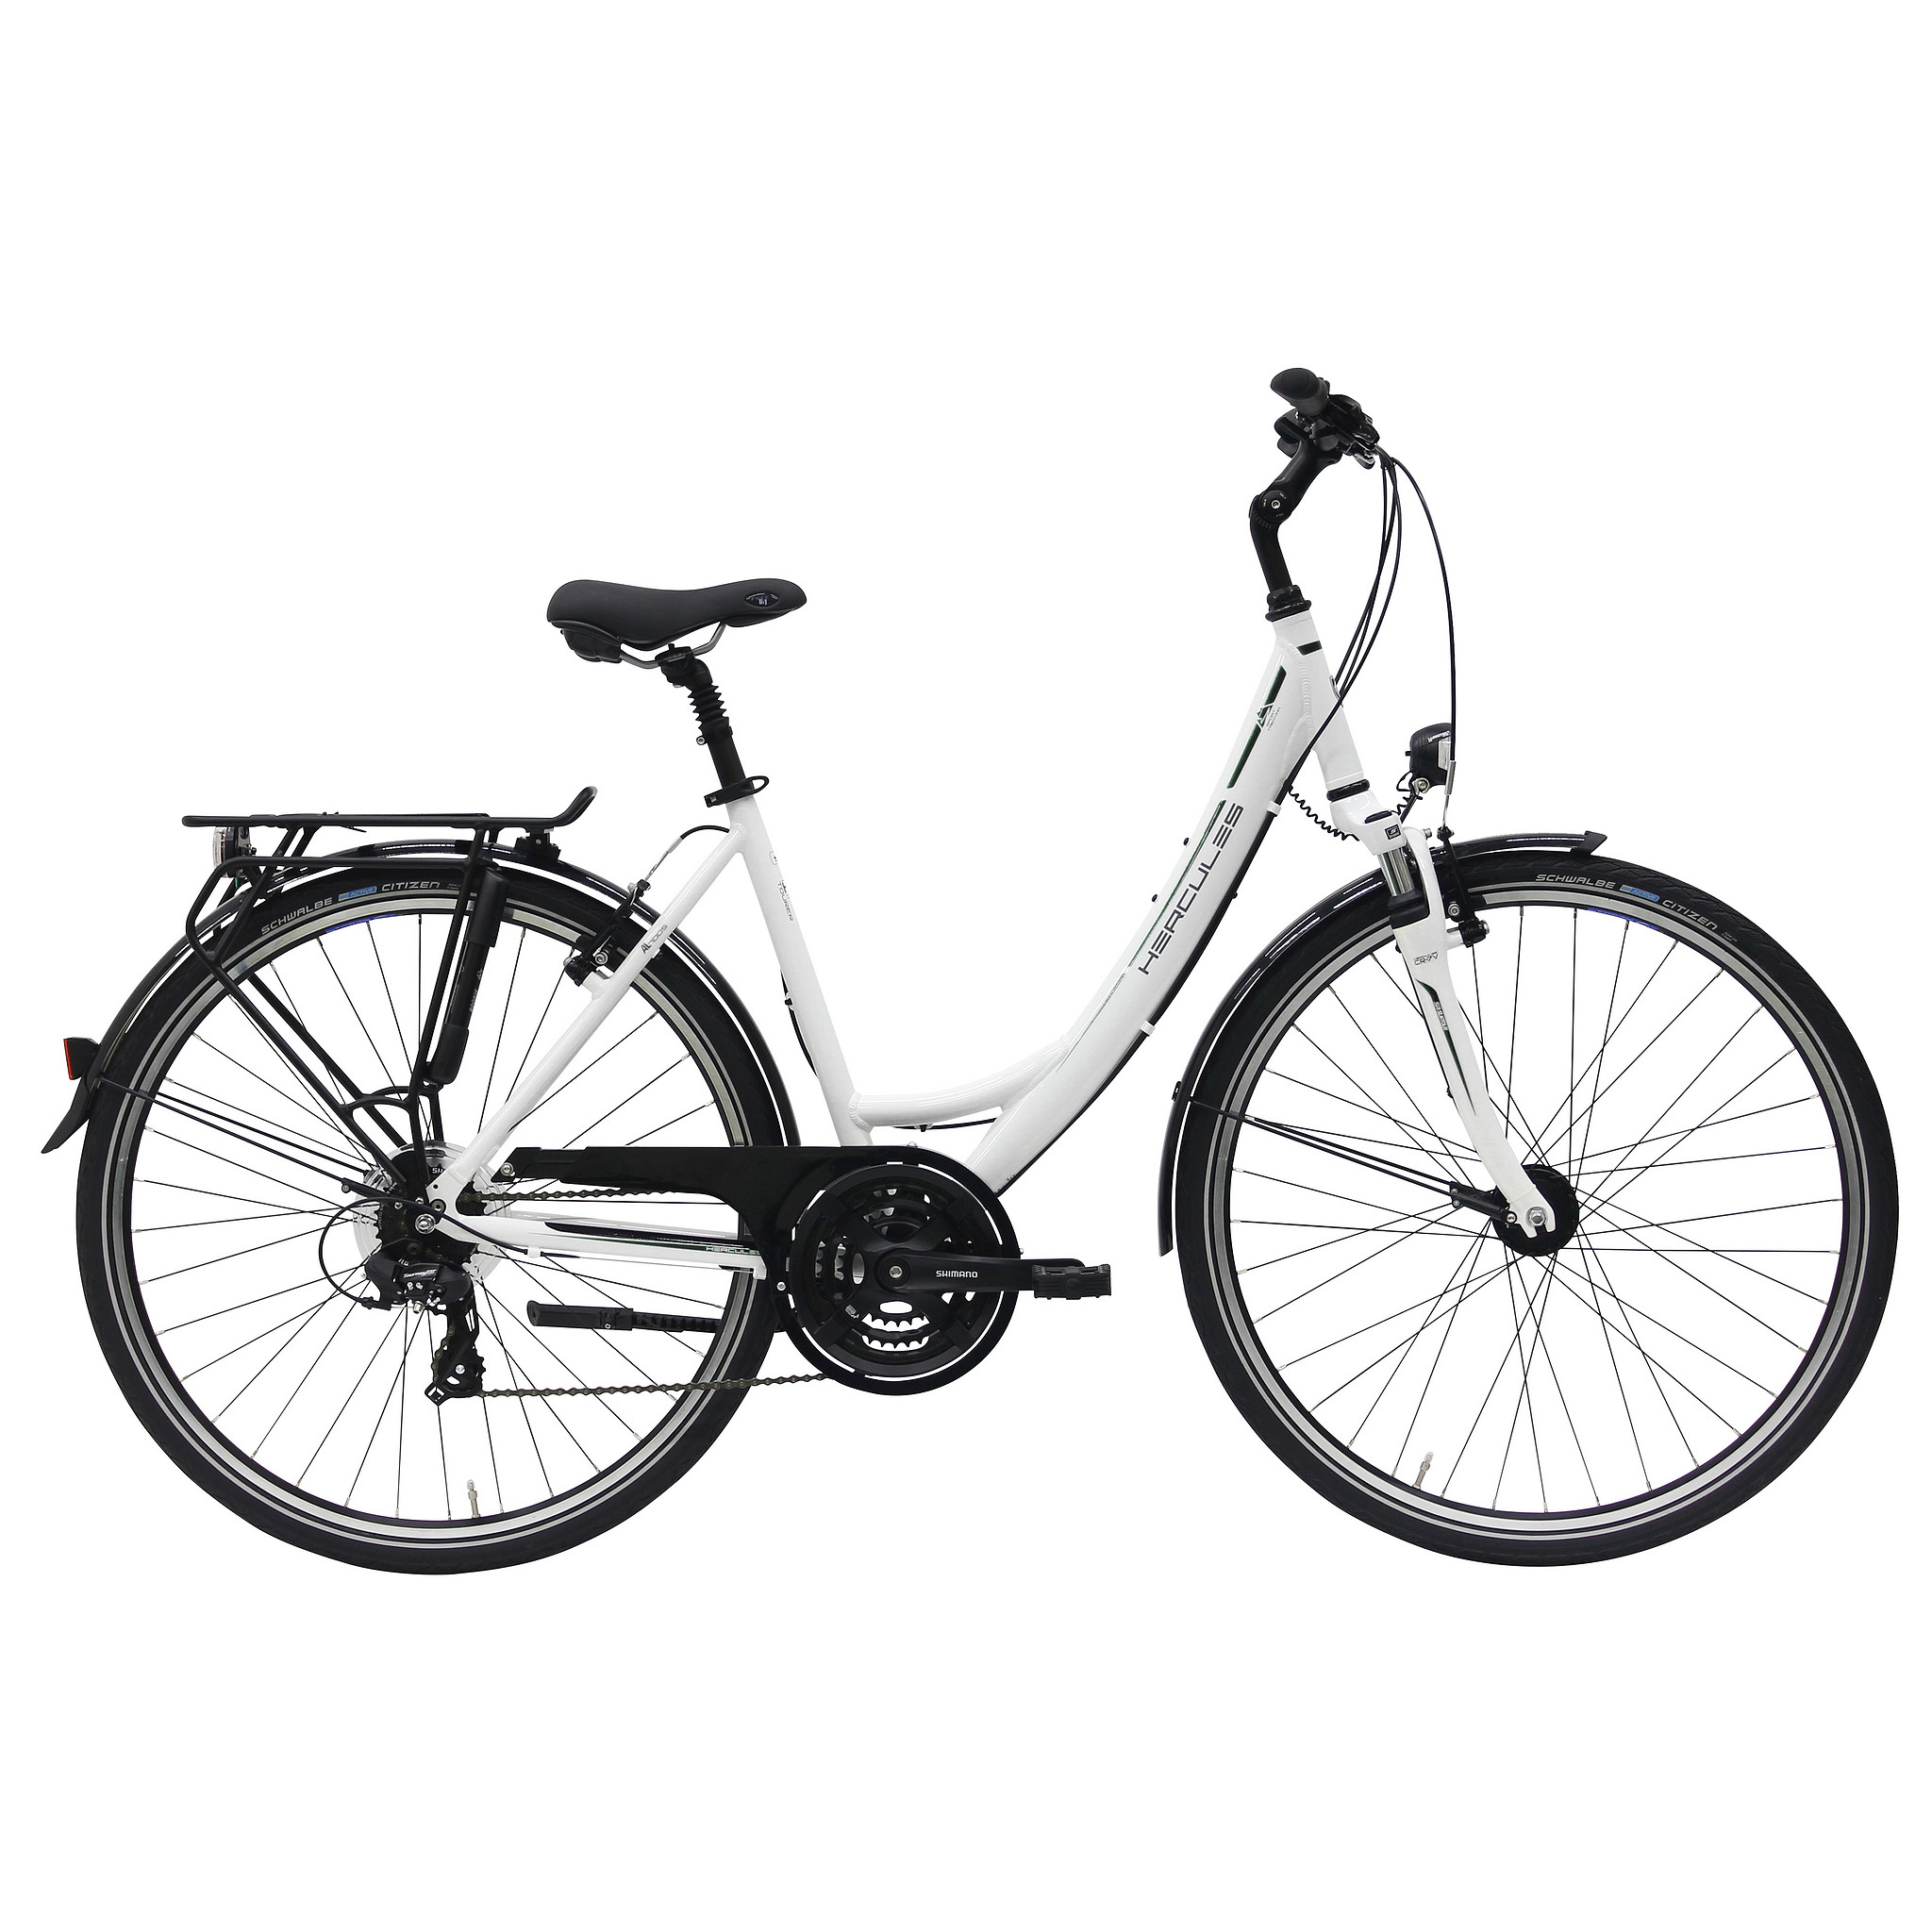 Hercules Sportieve fiets Tourer 21 dames wit 50cm Wit